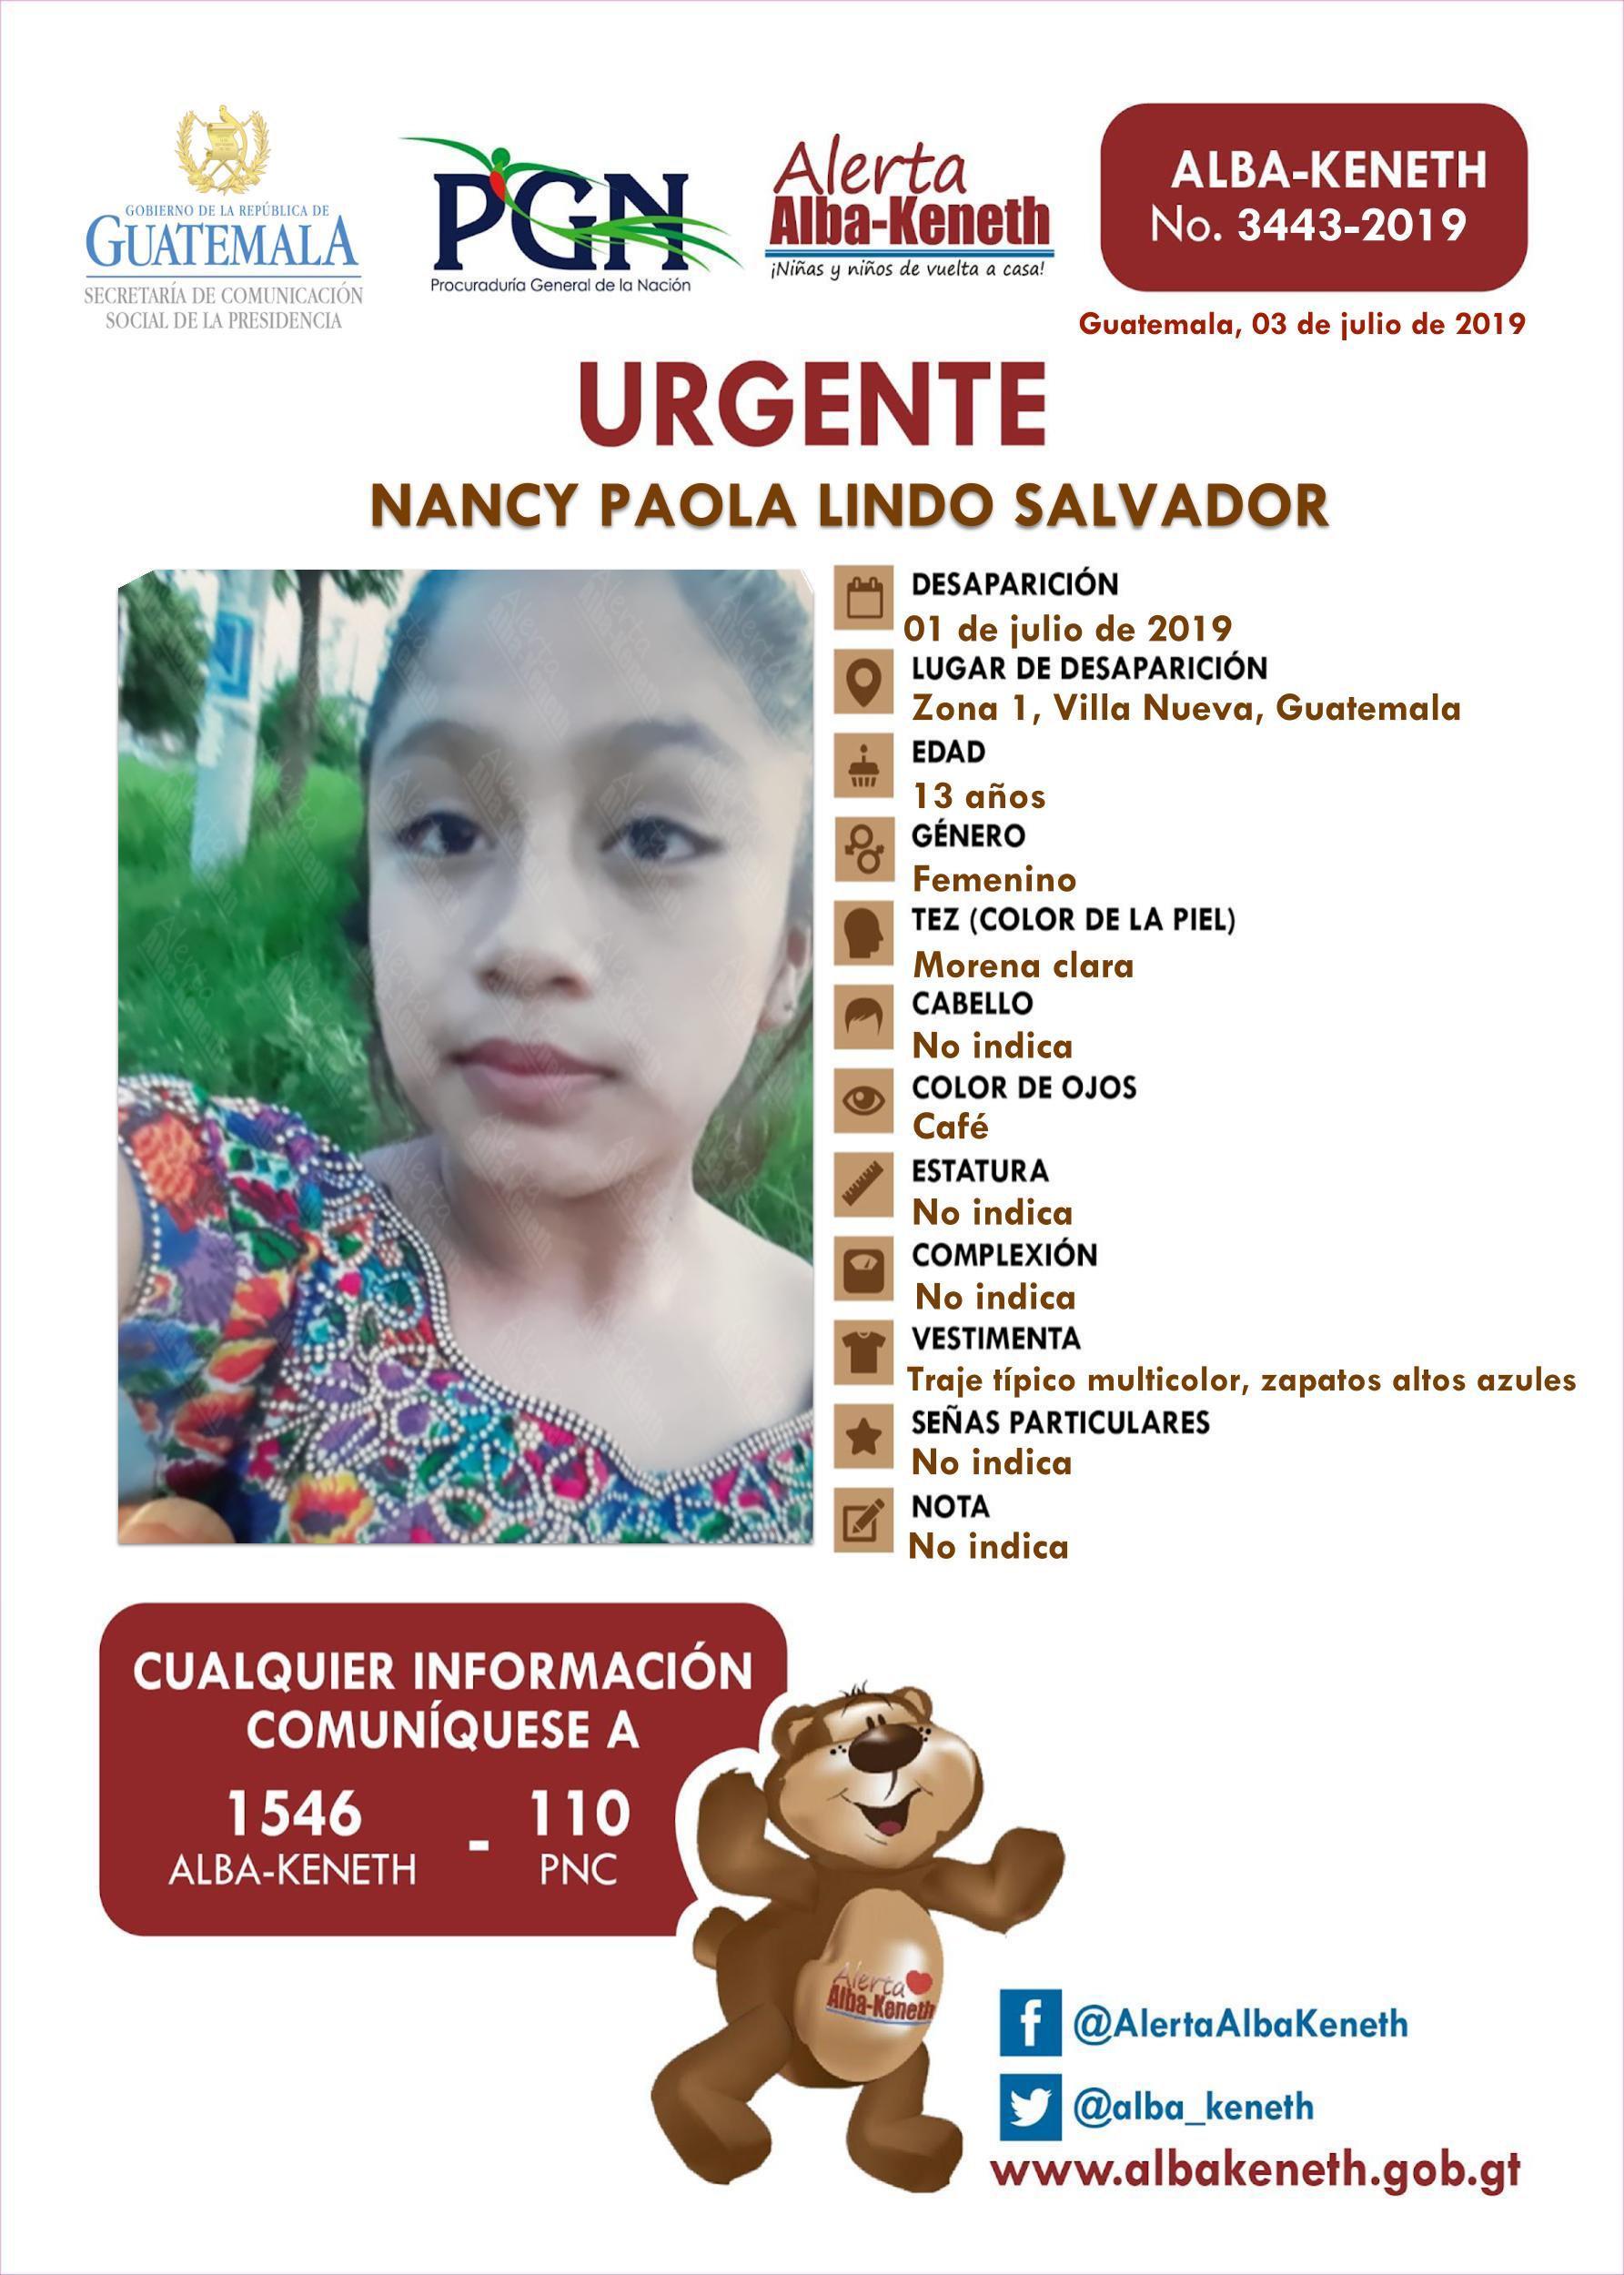 Nancy Paola Lindo Salvador